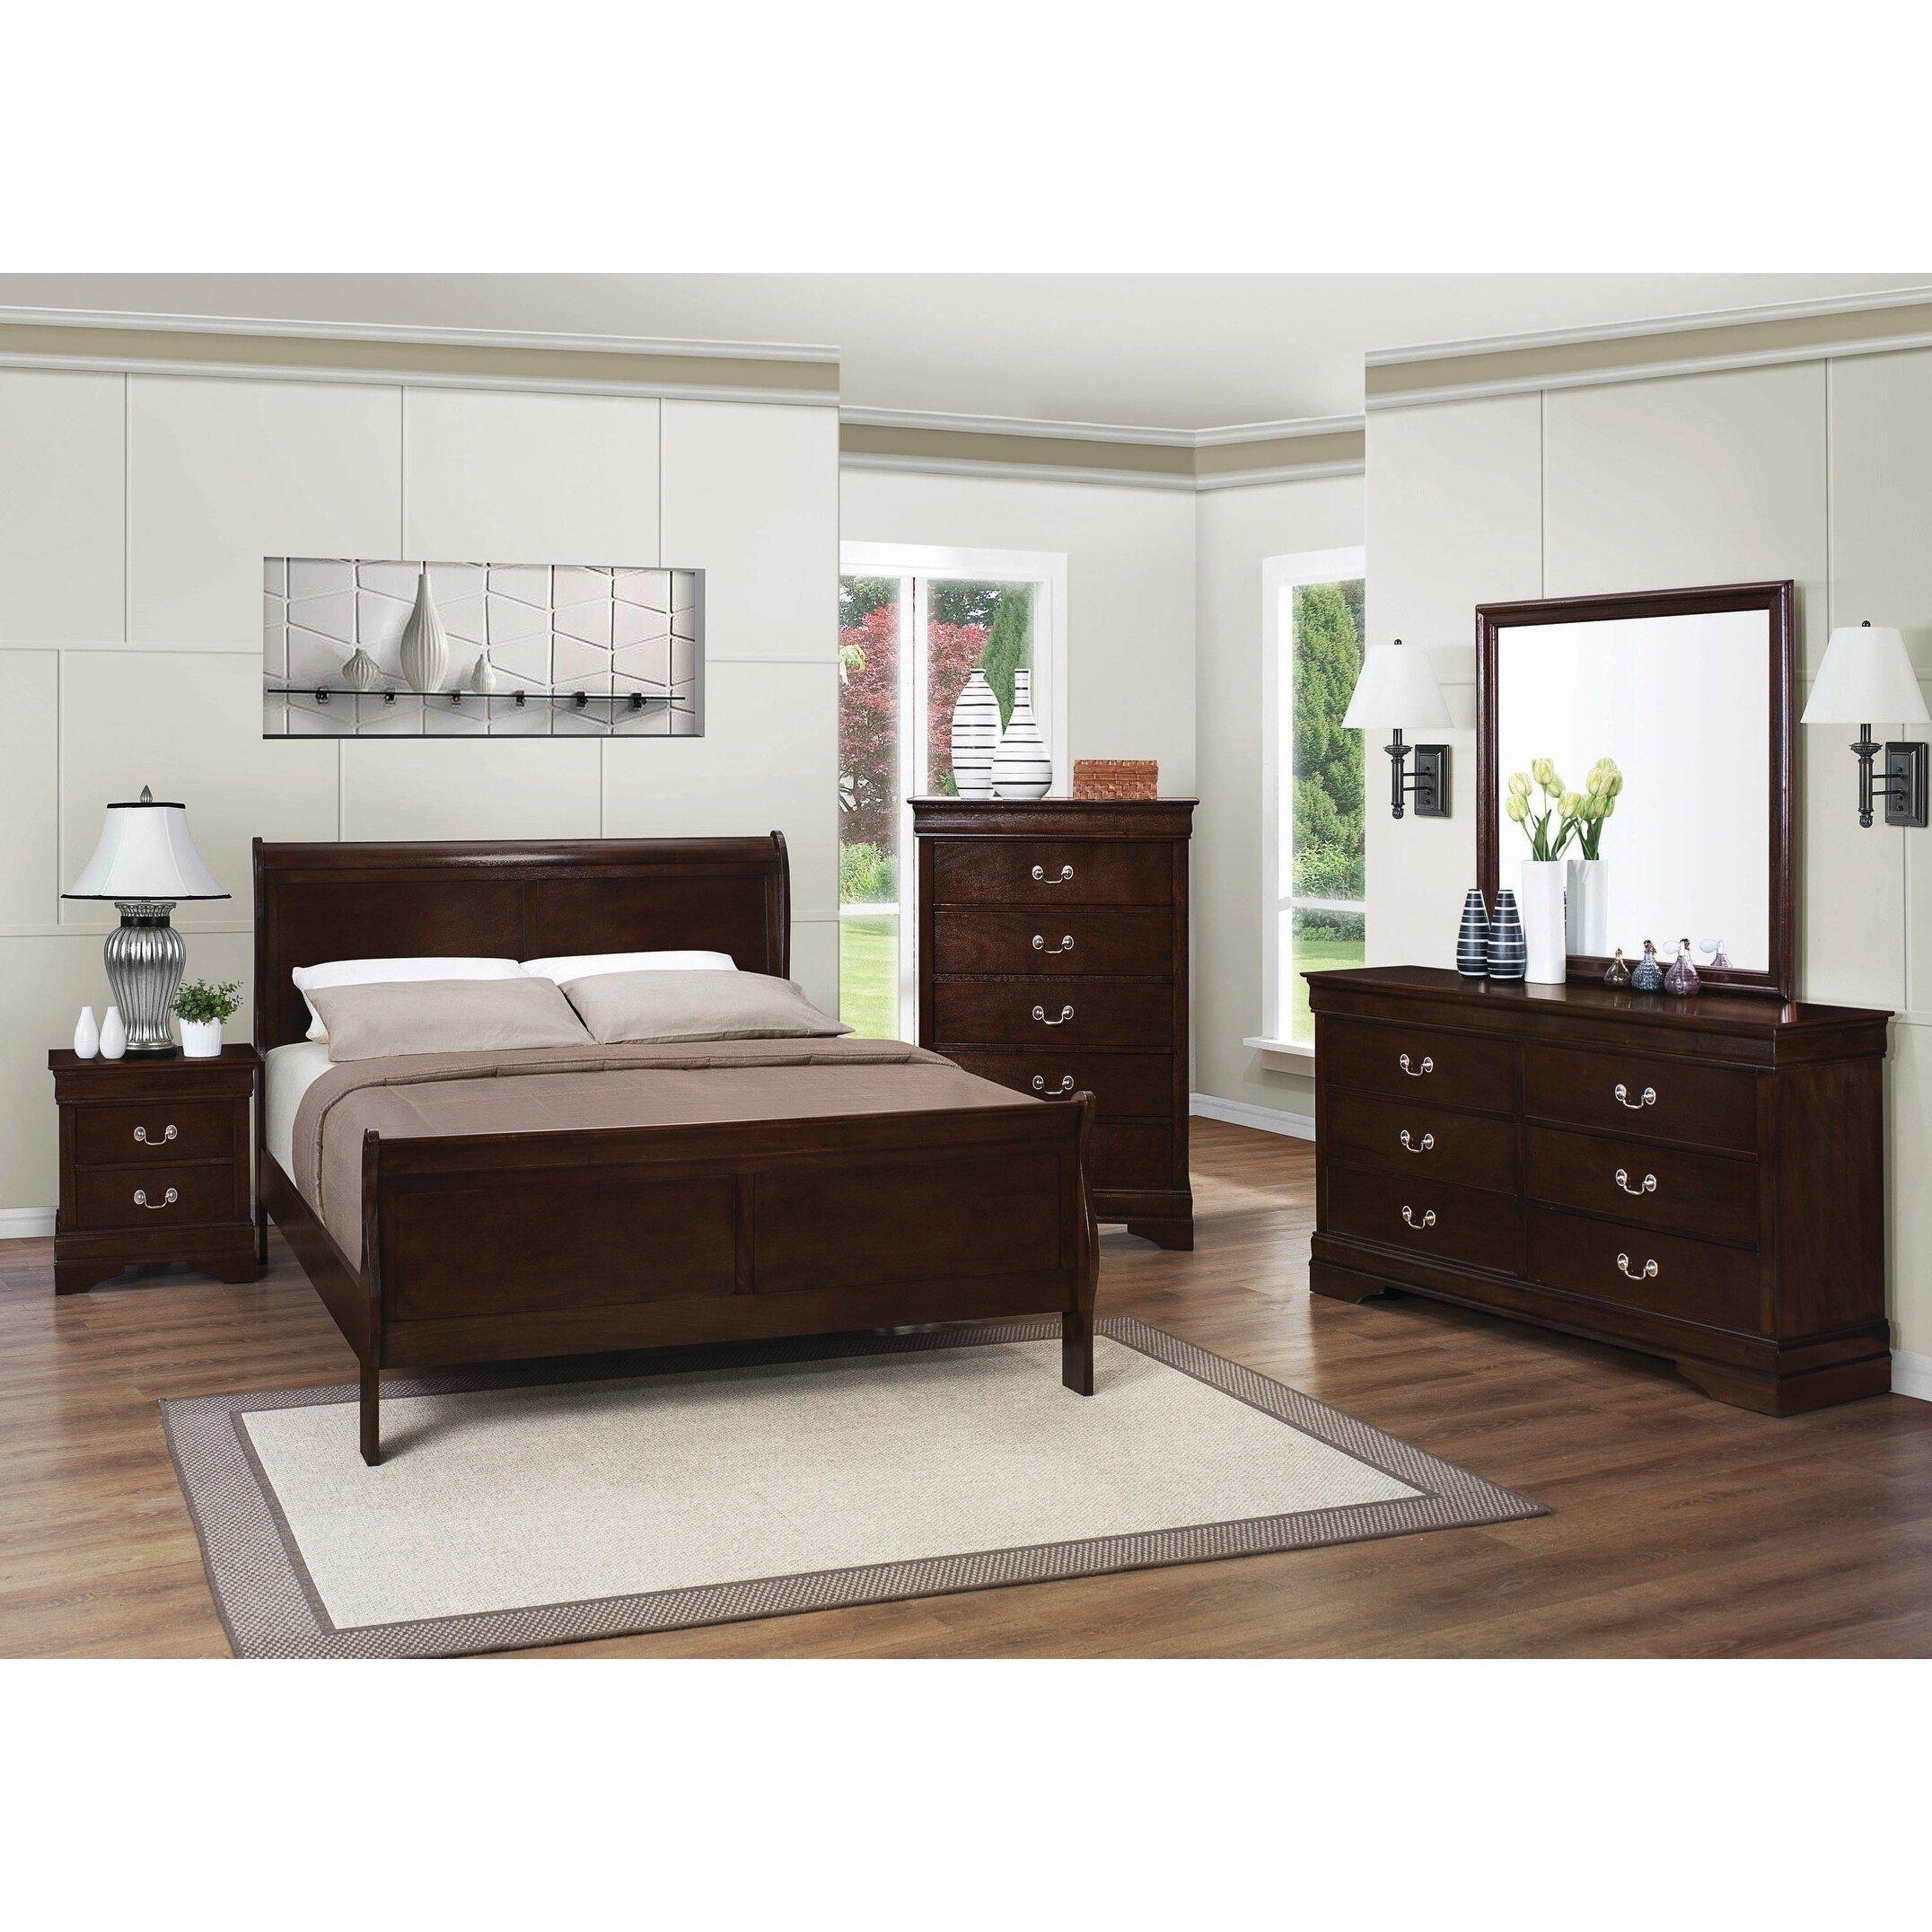 Queen Size Bedroom Suit Unique Louis Philippe Traditional Warm Brown 5 Piece Bedroom Set